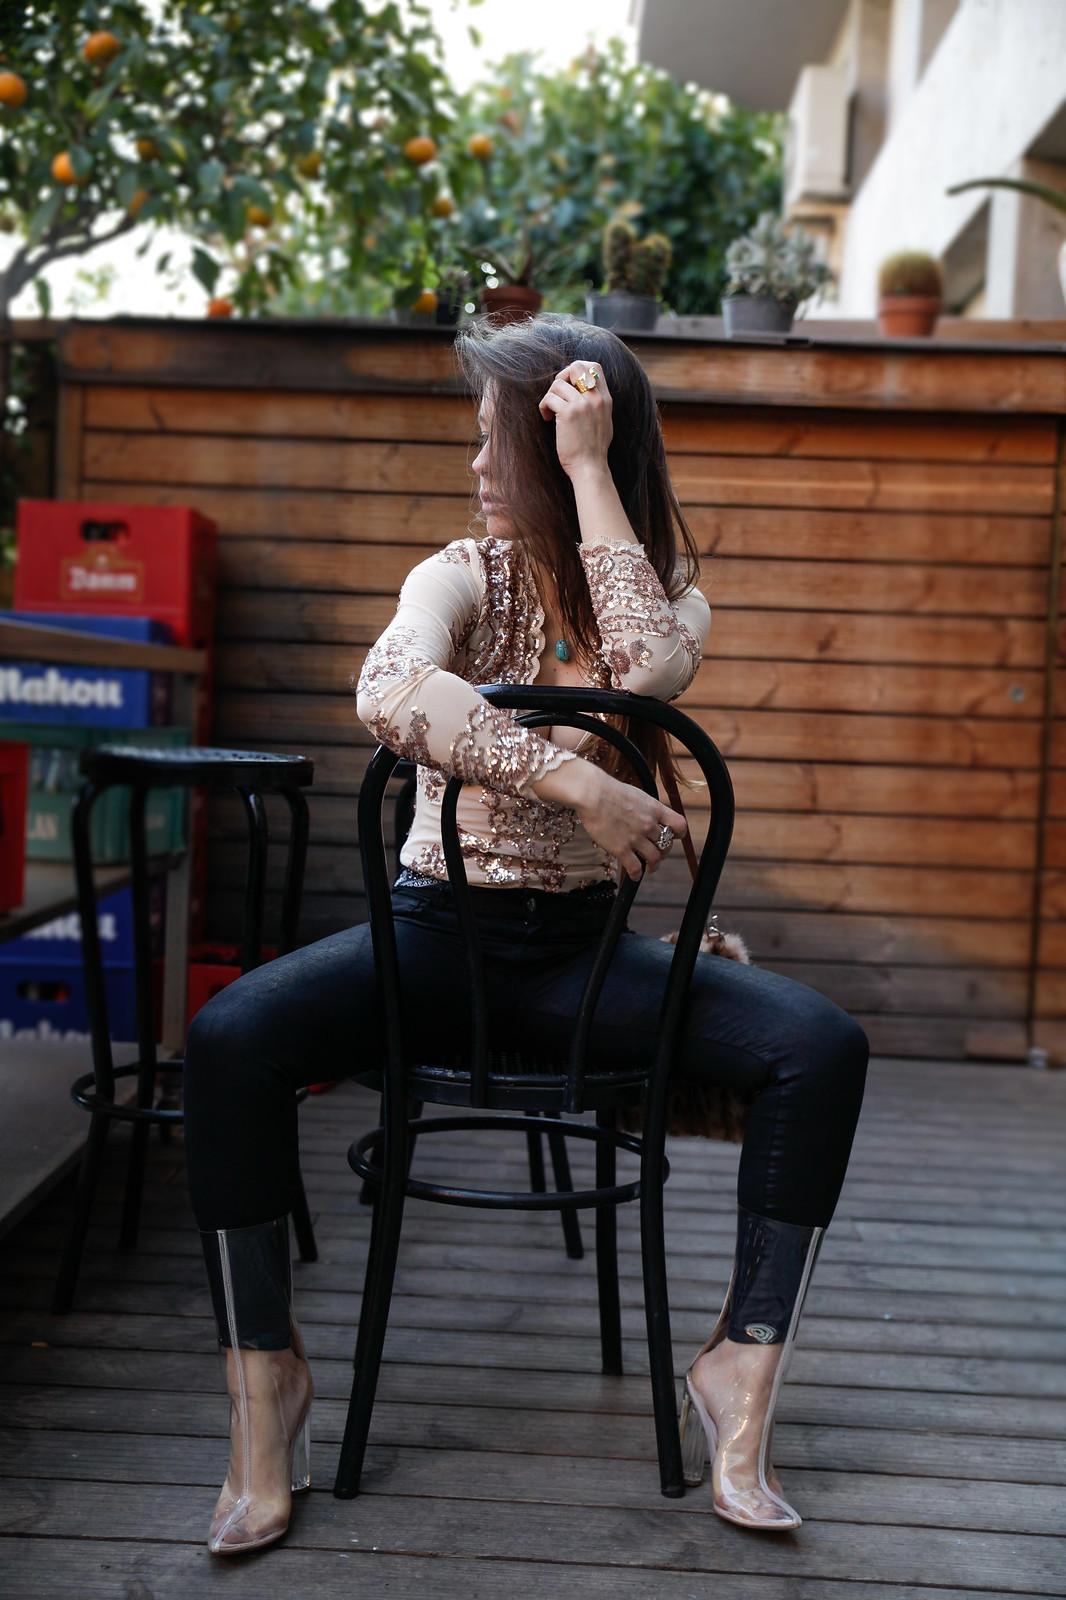 06_Sequins_Body_Nihgt_outfit_Danity_Paris_theguestgirl_laura_santolaria